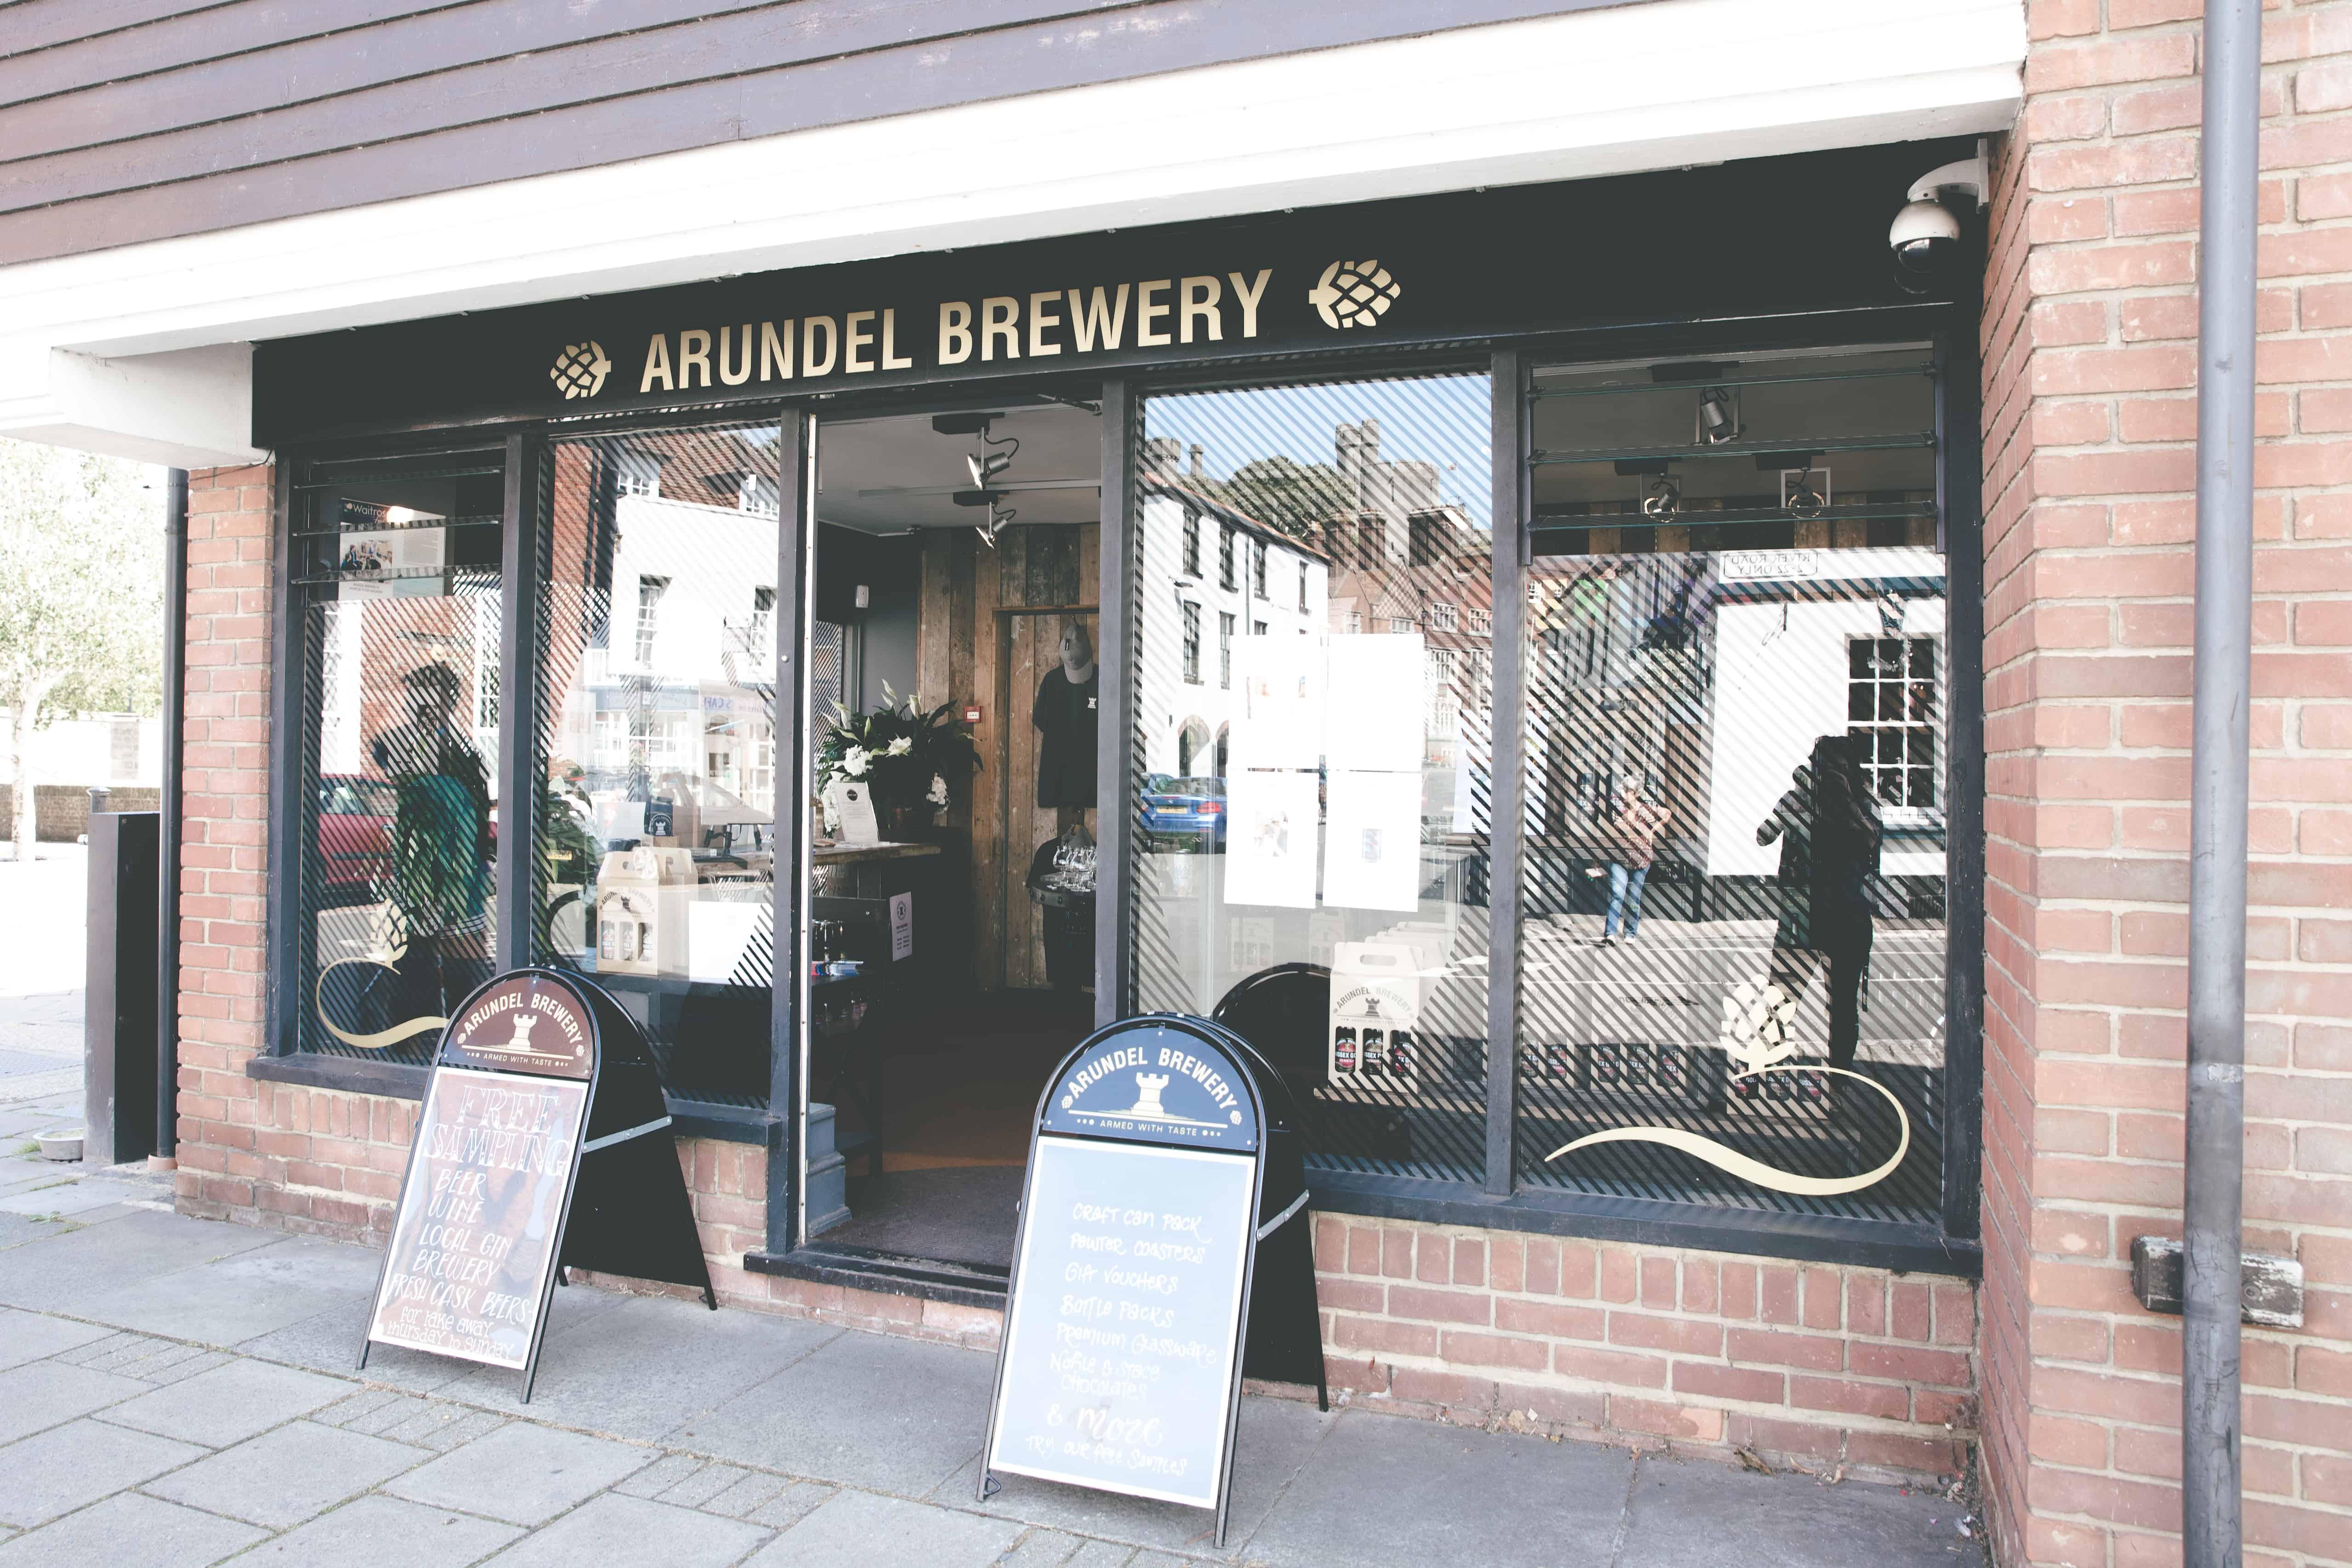 Arundel Brewery in Arundel, England